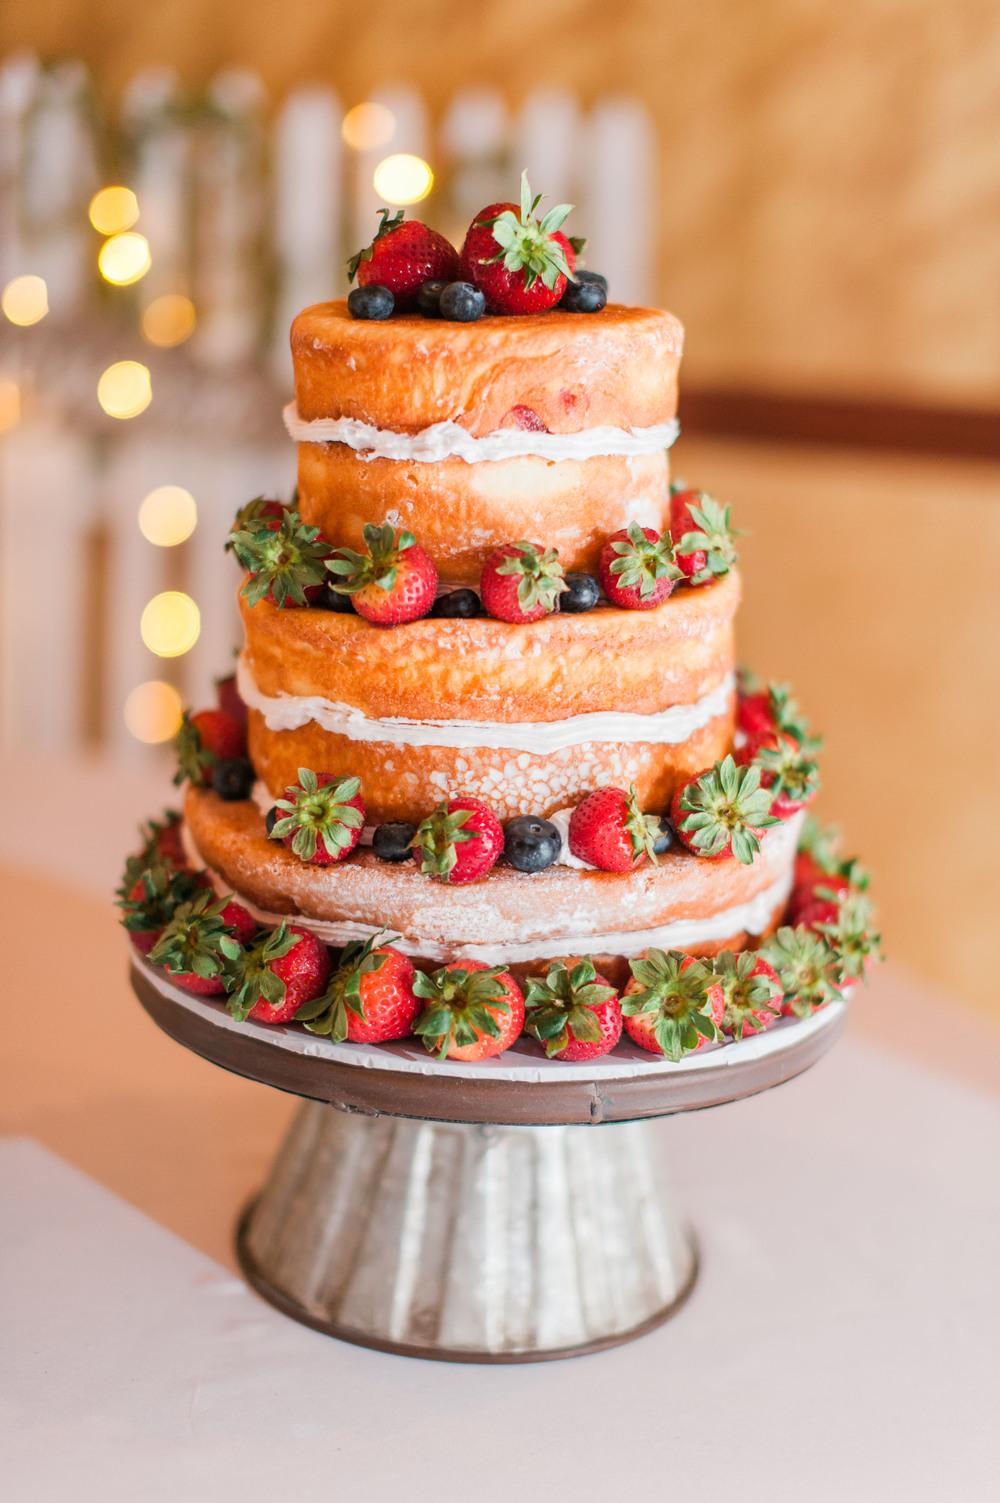 wedding cake by Omaha baker in an Omaha wedding venue